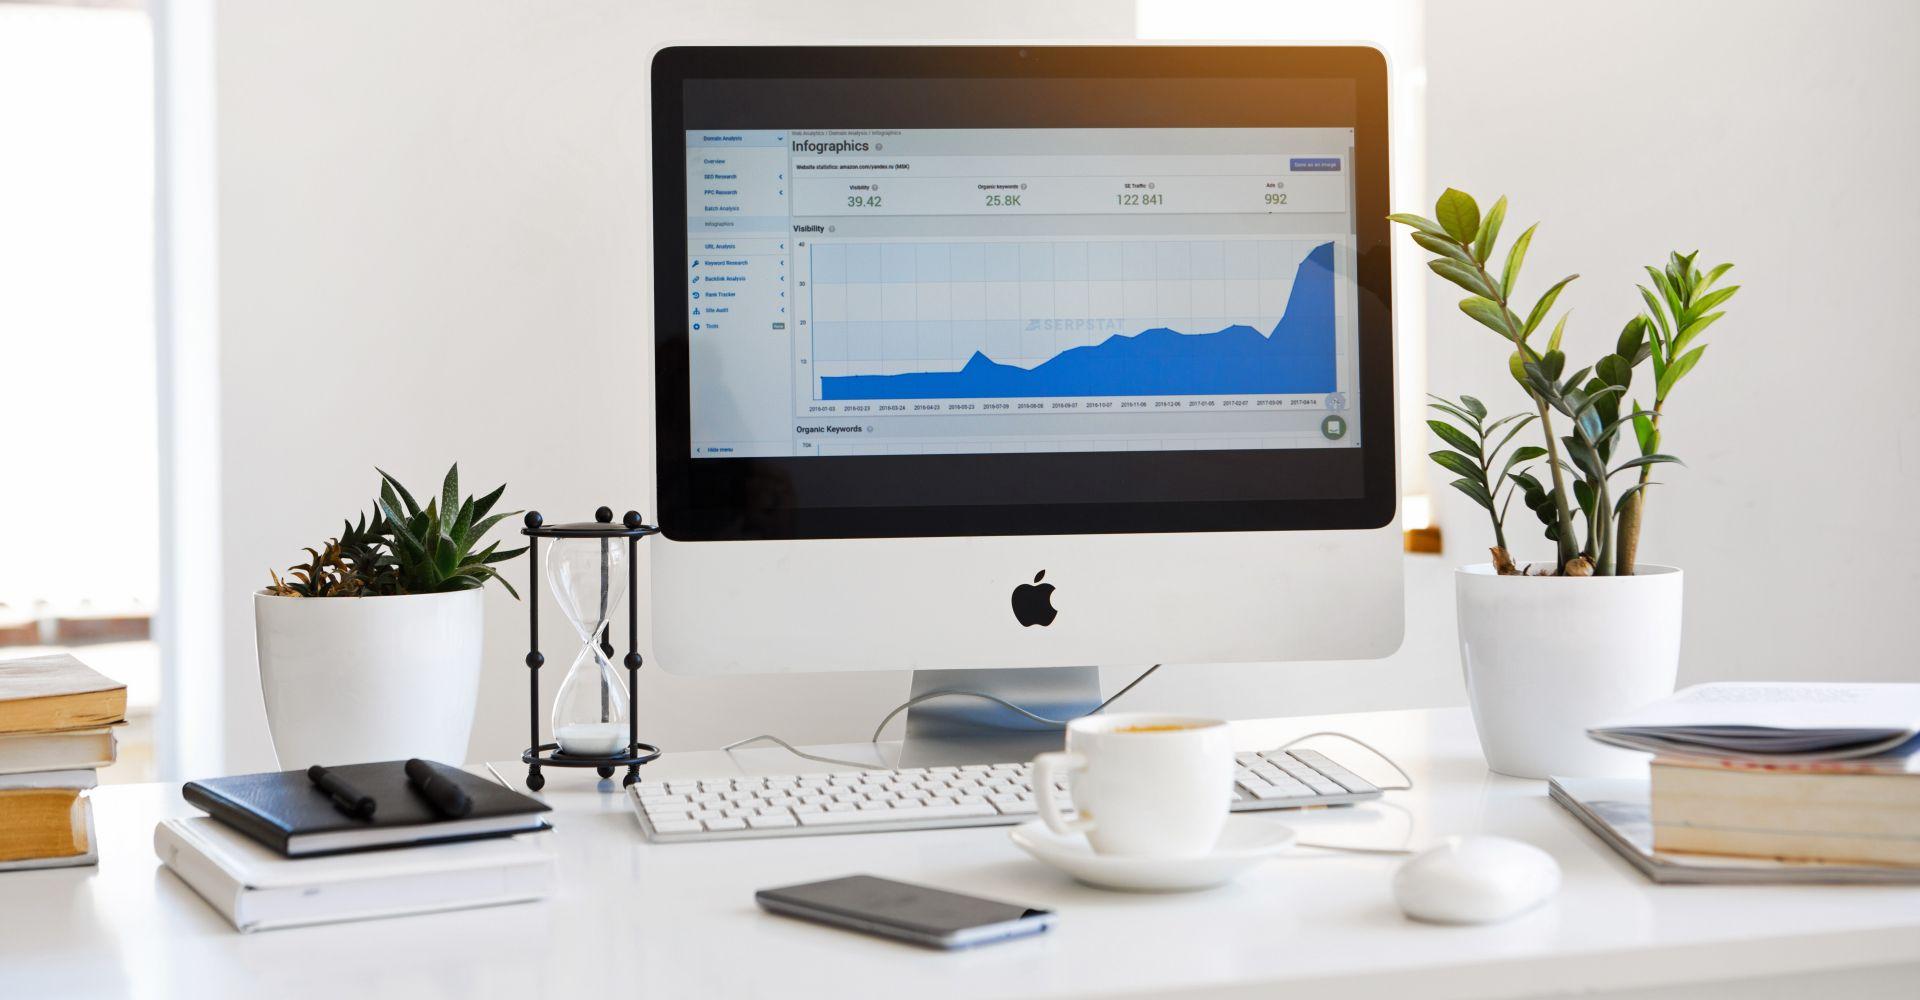 Conversie Optimalisatie via More Online Marketing